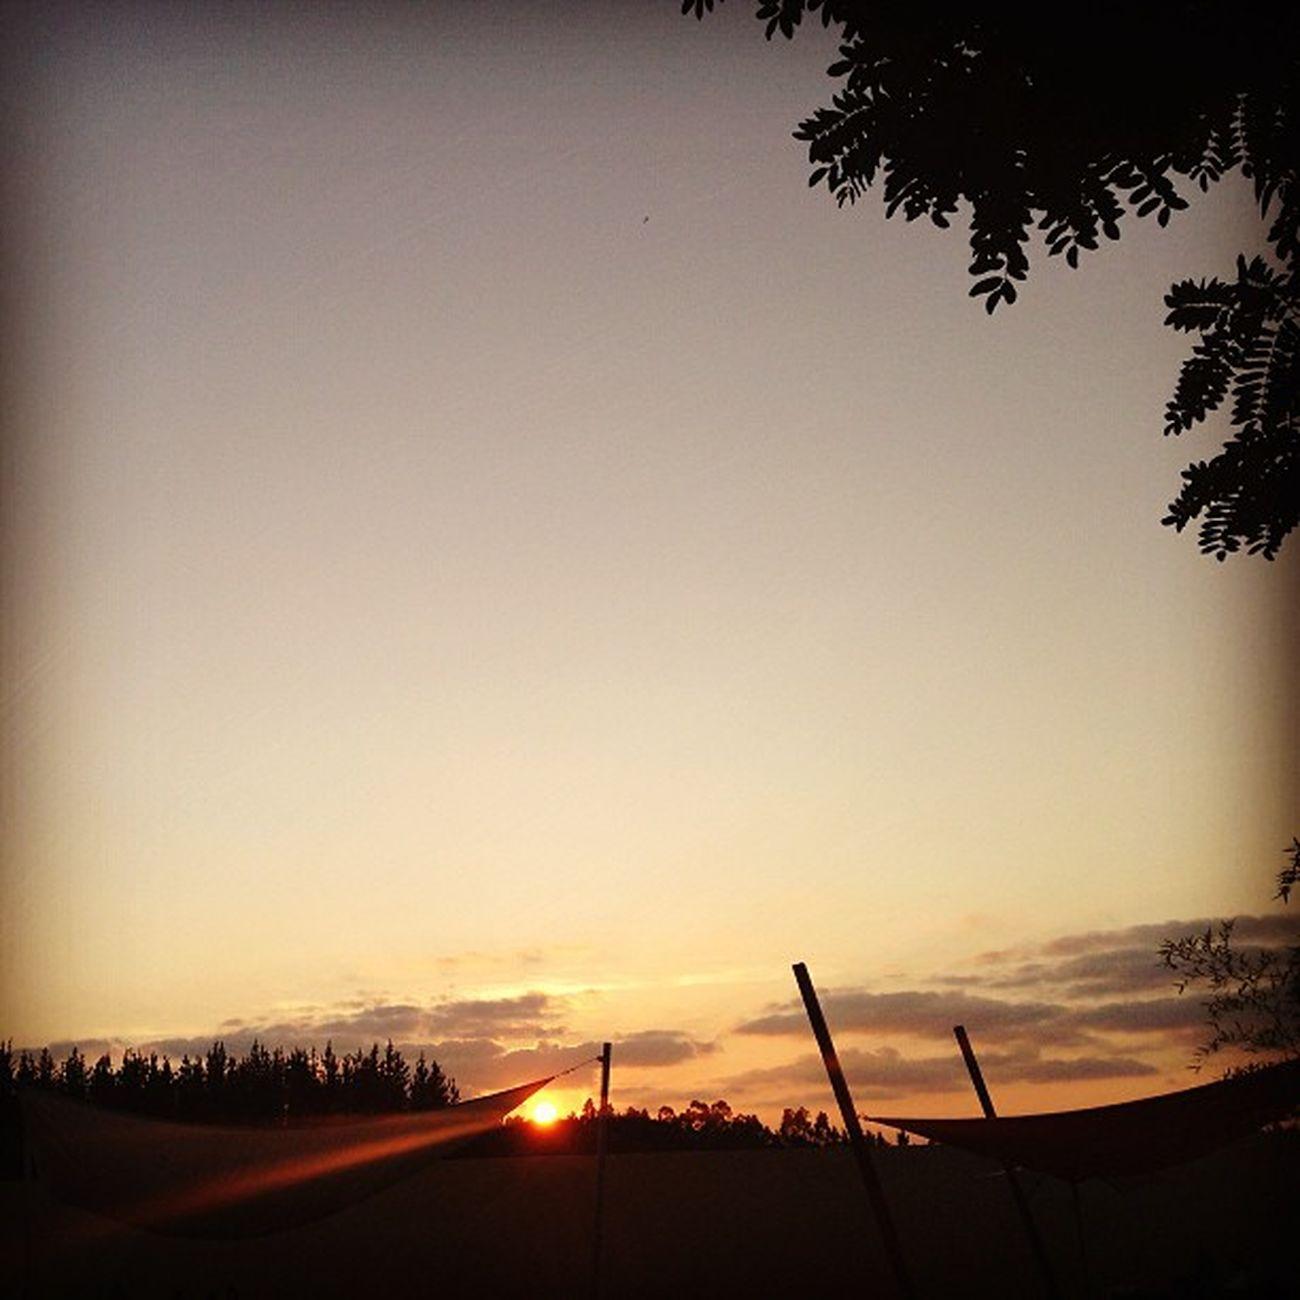 #igers #iphone5 #igmasters #ig_captures #ig_portugal #igworldclub #igersportugal #igers_figueira #cantanhede #arazede #portugal #portugaligers #portugal_lovers #portugal_em_fotos #portugaloteuolhar #portugaldenorteasul #casamento #noivos #quintaoliveira # Restaurante Ig_captures Summer Arazede Sun Portugaloteuolhar Sunset Portugal_lovers Igers_figueira Portugal Portugal_em_fotos Igworldclub IPhone5 Ig_portugal Casamento Noivos Igers Portugaligers Igersportugal Quintaoliveira Portugaldenorteasul Cantanhede Igmasters